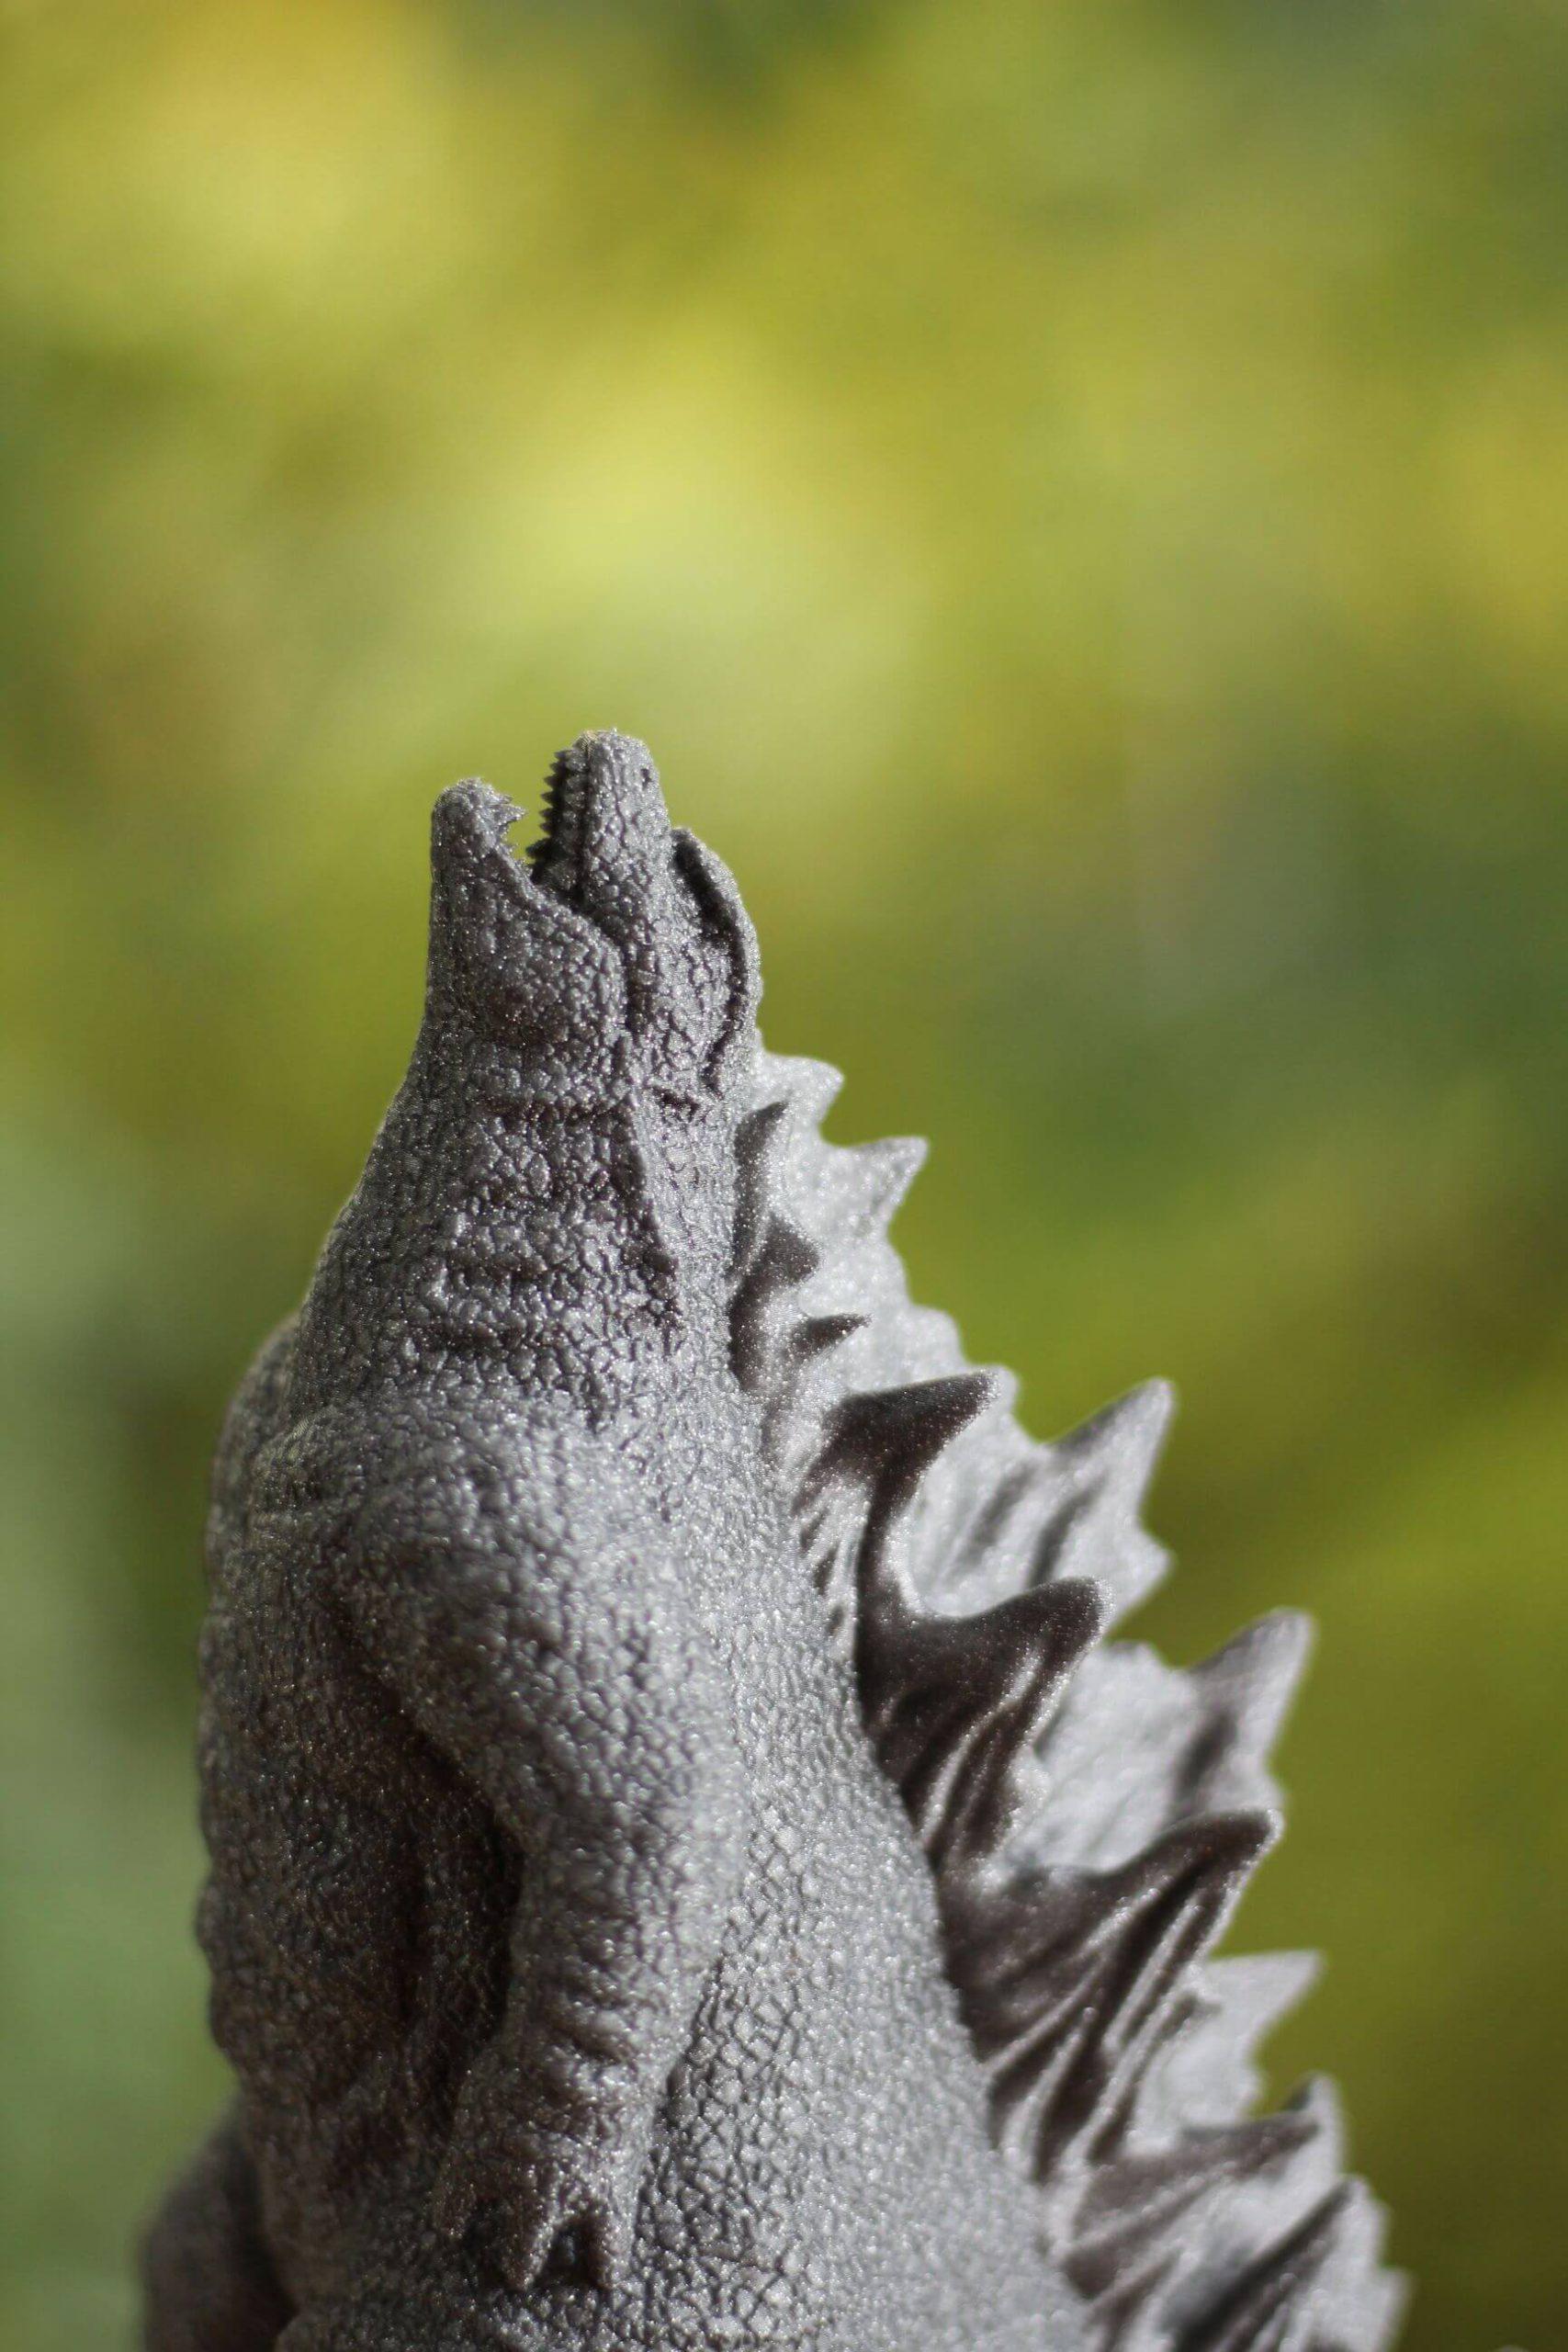 Godzilla-on-CR-6-SE-3